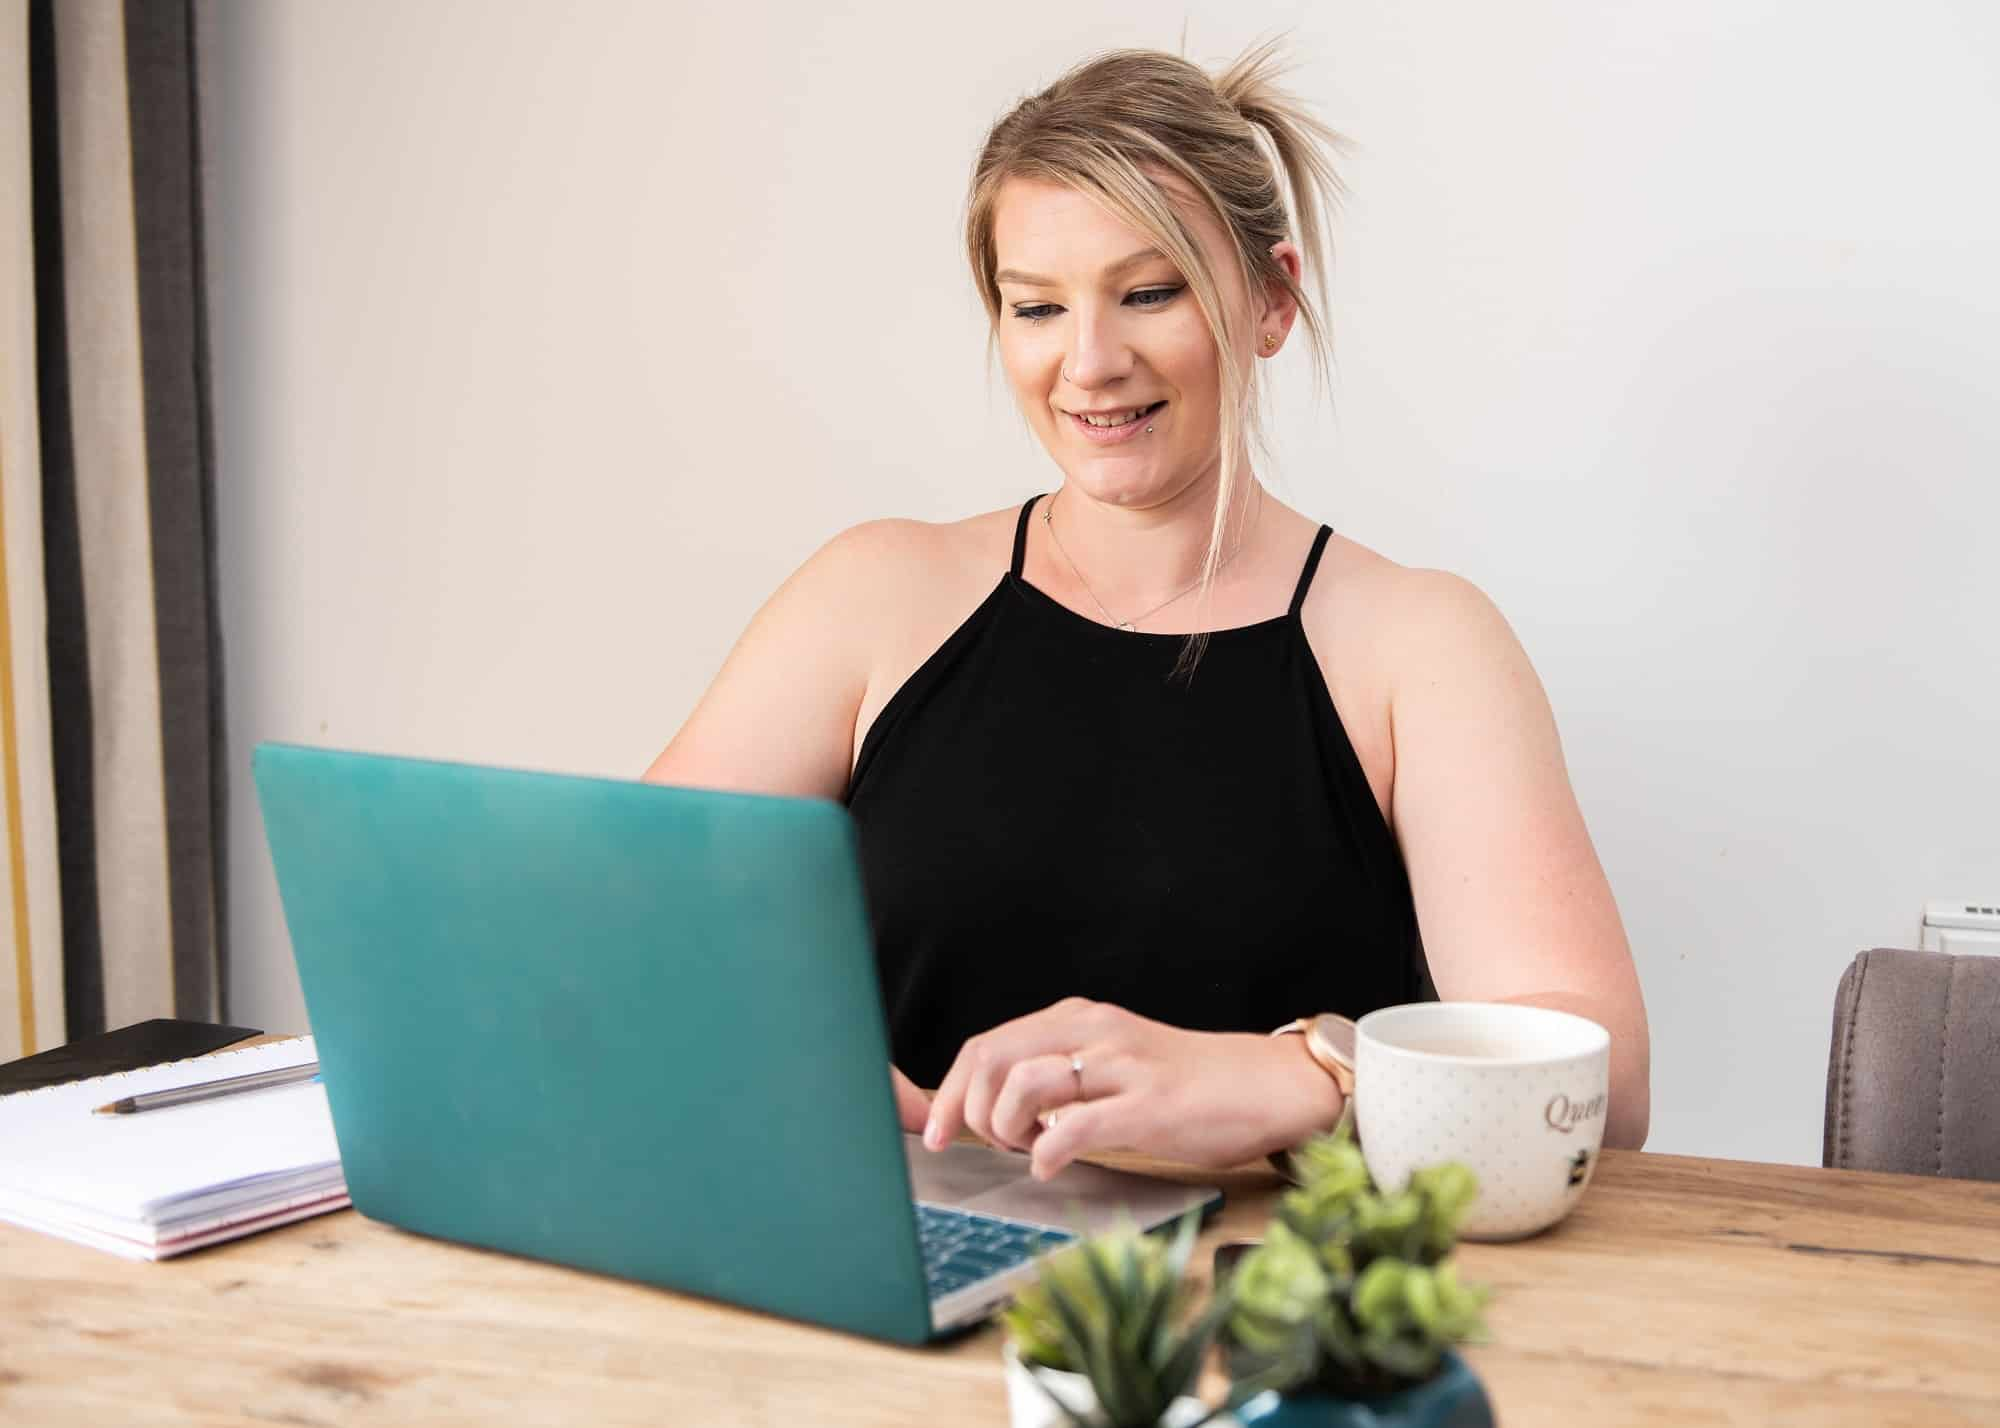 business portrait od lady sat at desk on her laptop